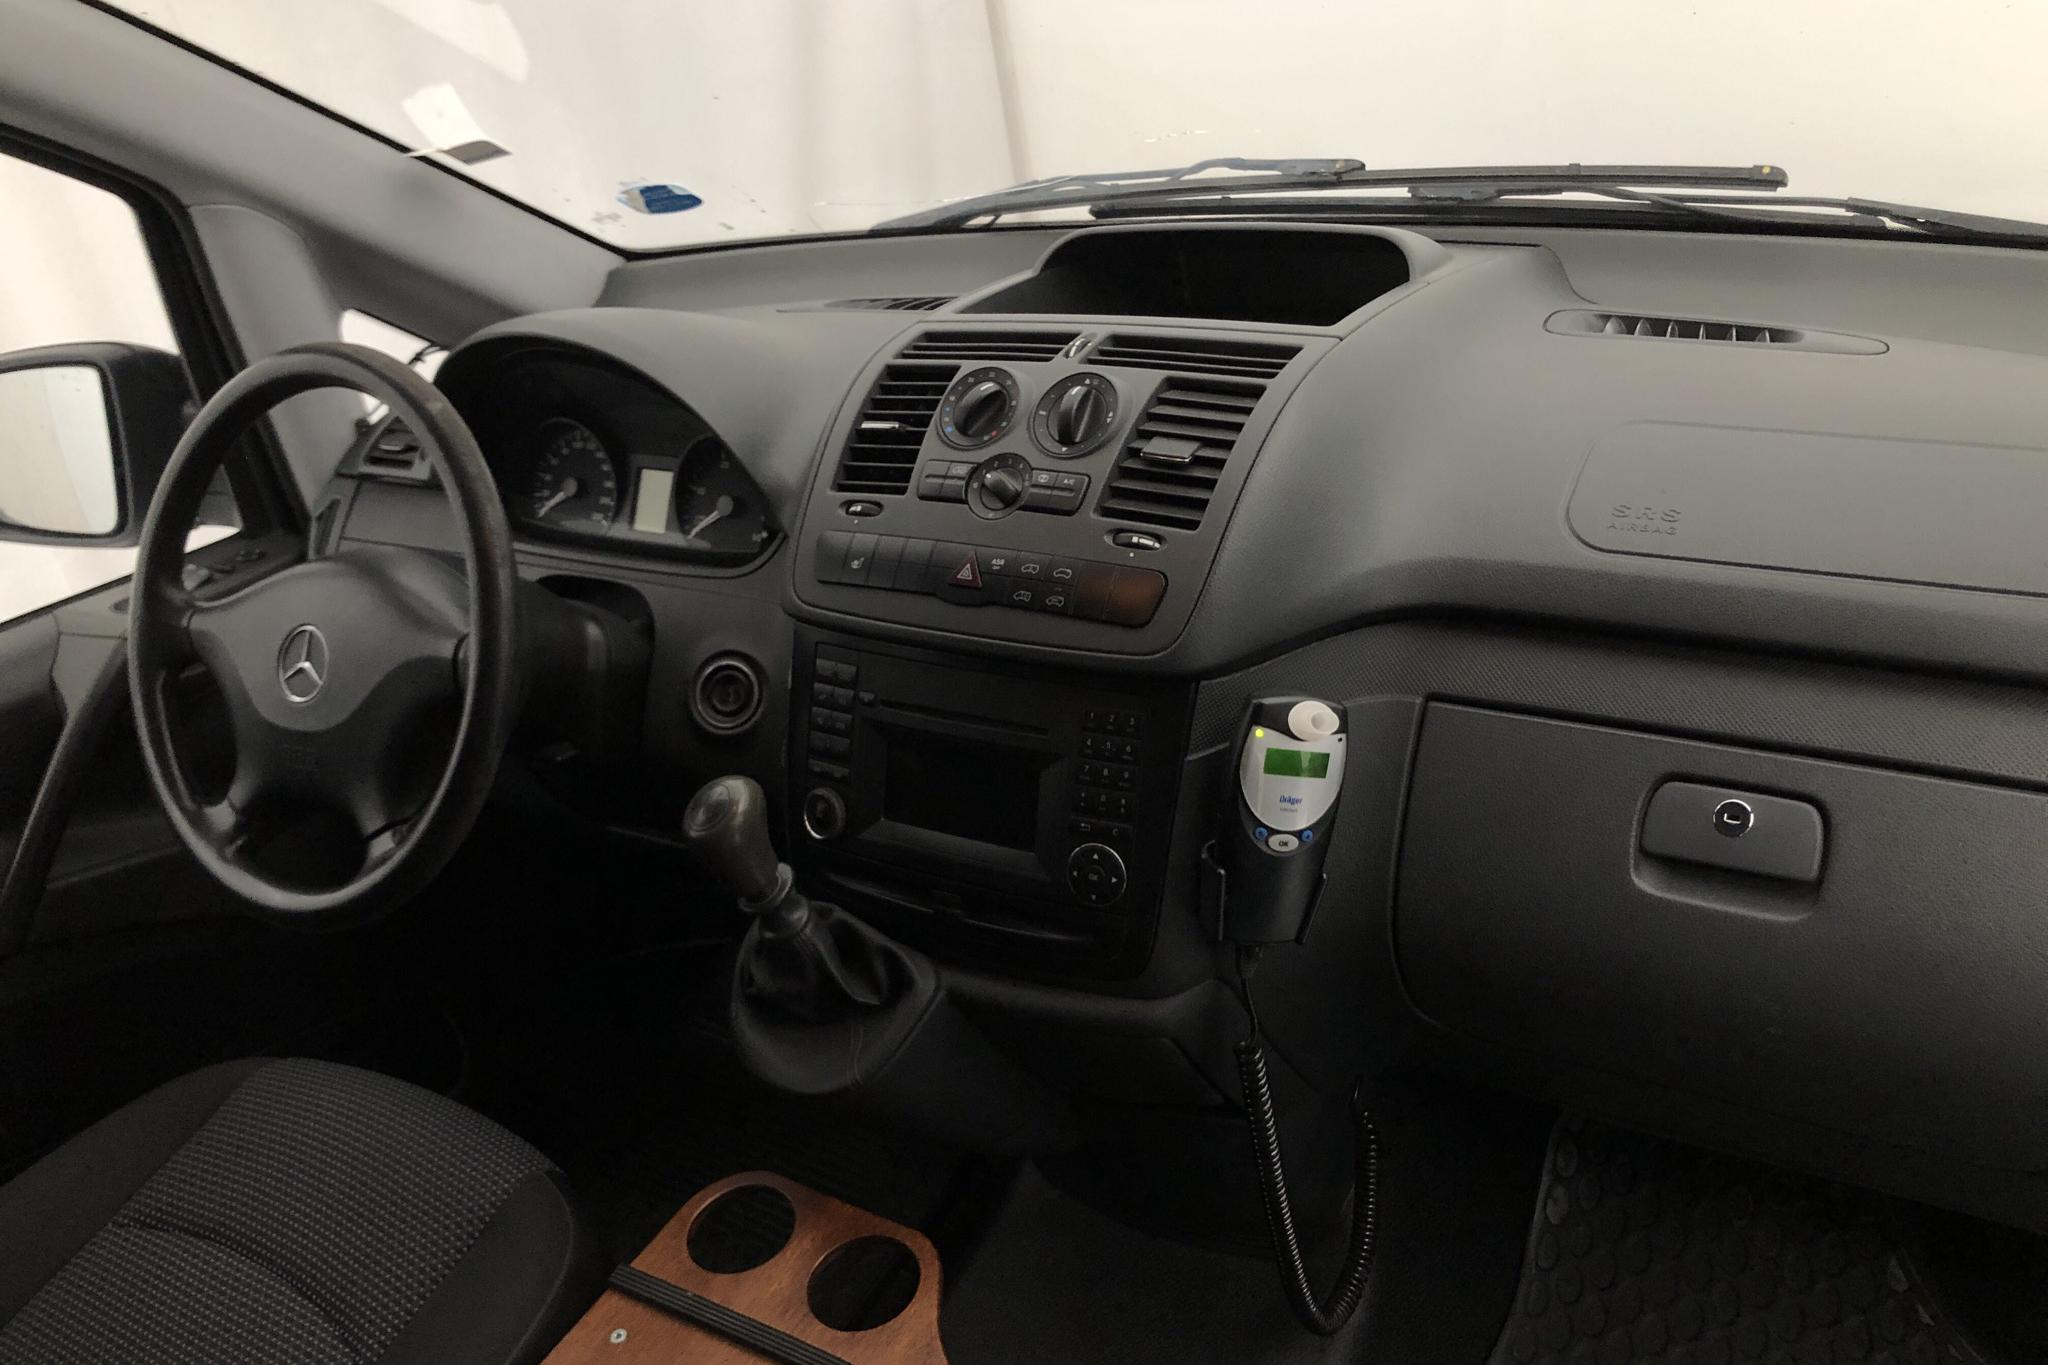 Mercedes Vito 113 CDI W639 (136hk) - 13 164 mil - Manuell - vit - 2011